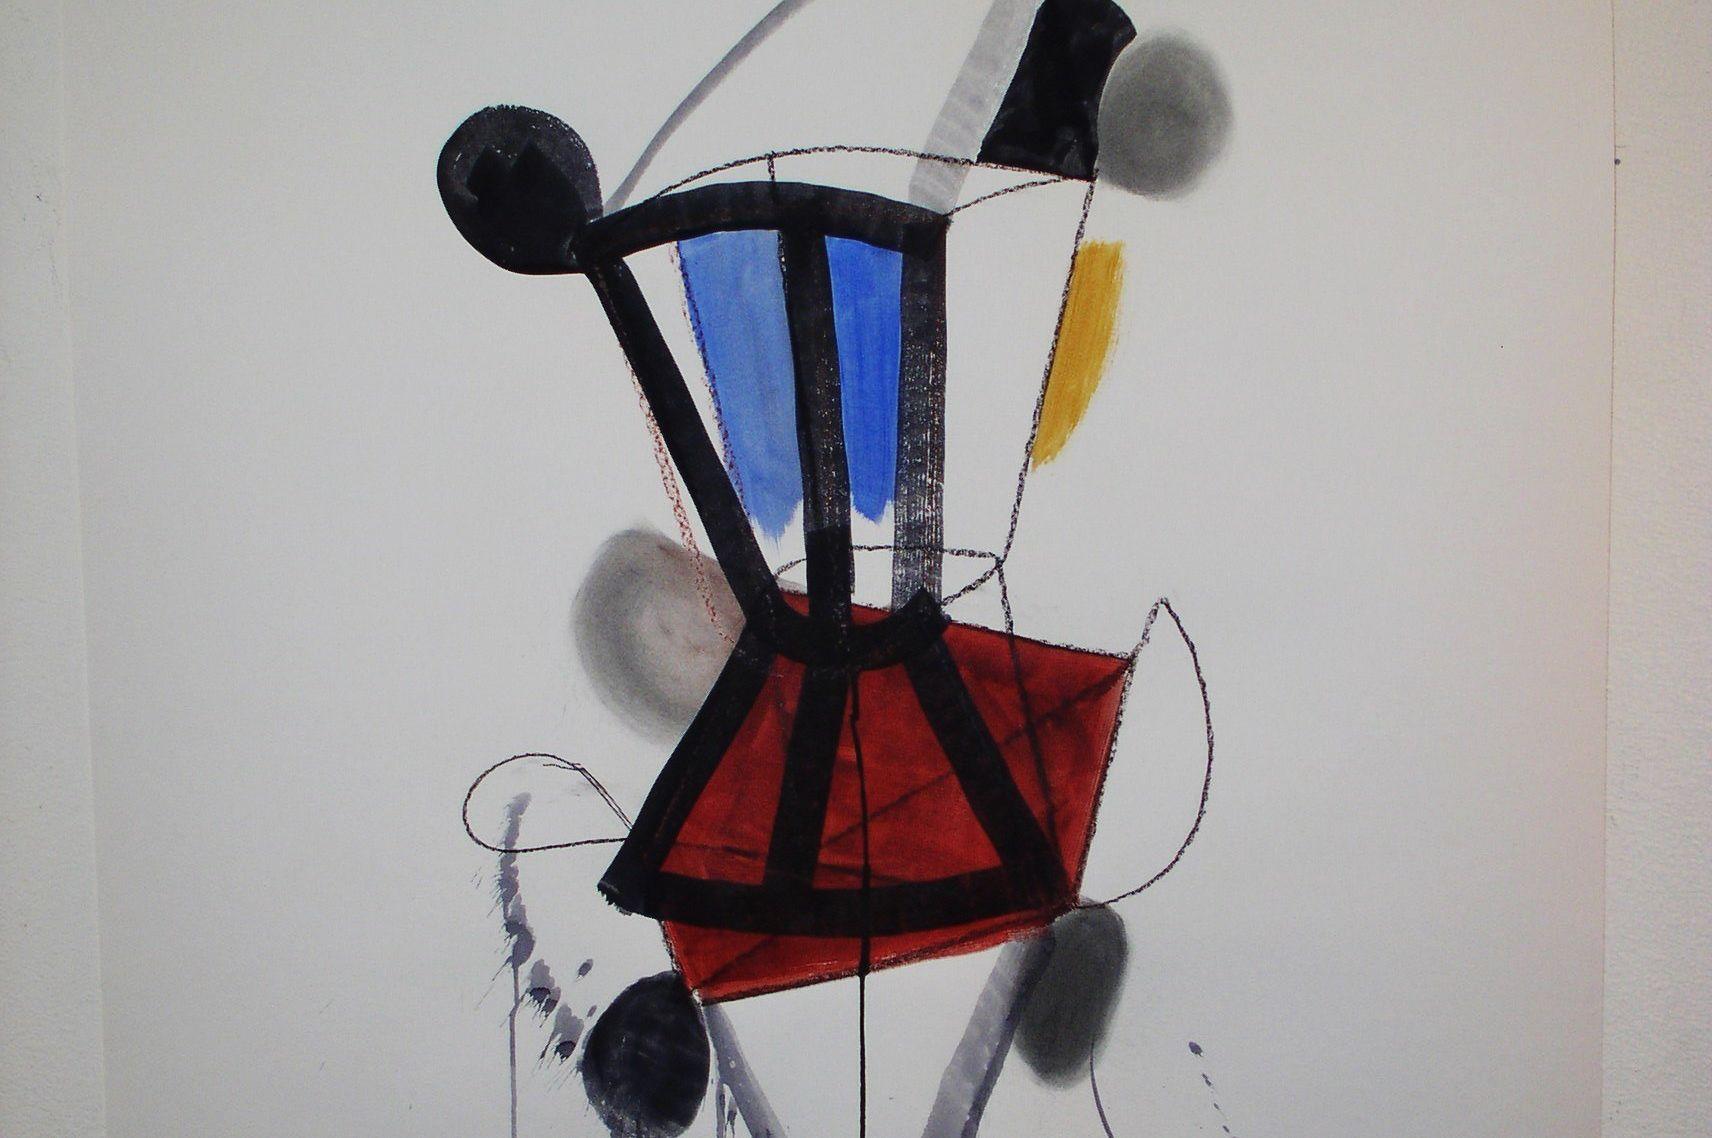 Soul catchers chair   2  2011 36x48 inch. mixed media on paper. q2e7xj